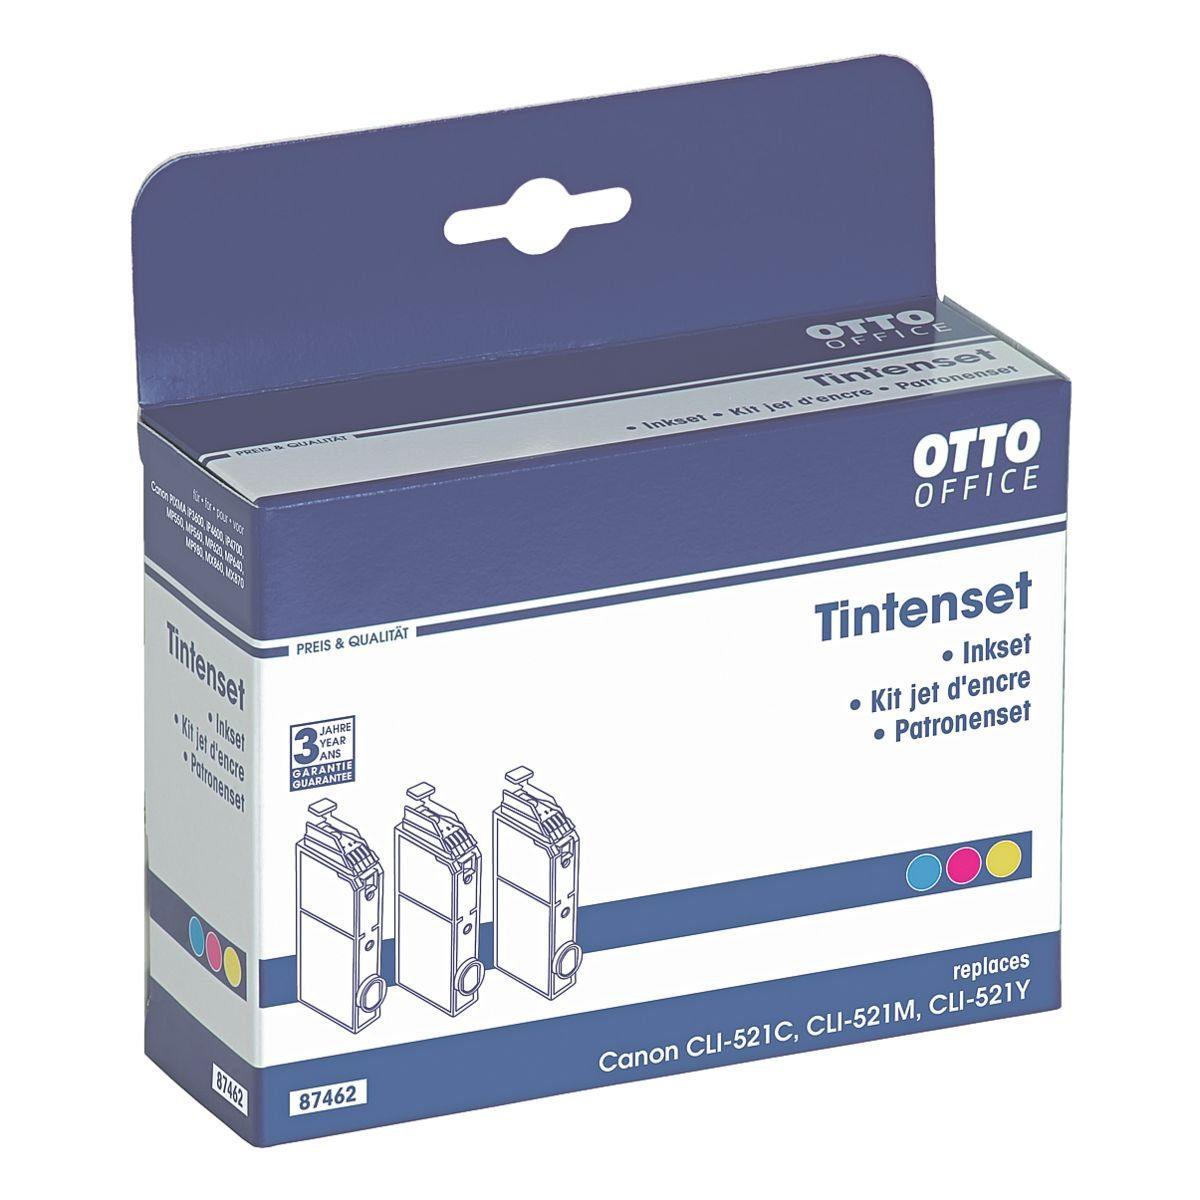 OTTO Office Standard Tintenpatronen-Set ersetzt Canon »CLI-521CMY«